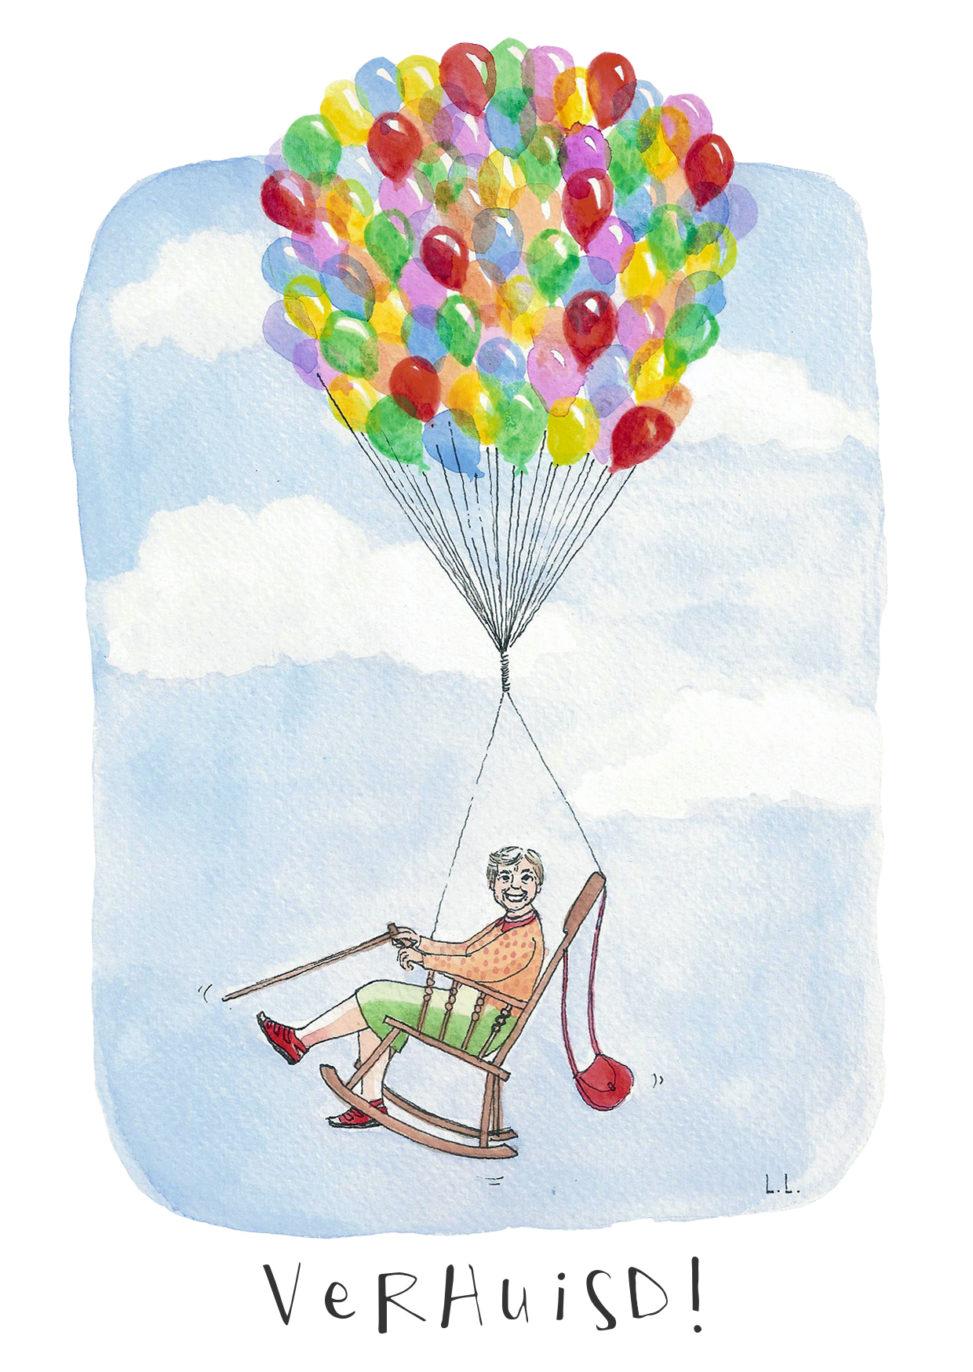 illustration sketch drawing illustrator pencil handdrawn illustrate your world lilian leahy rotterdam amsterdam artwork fine art moving new address announcement card design